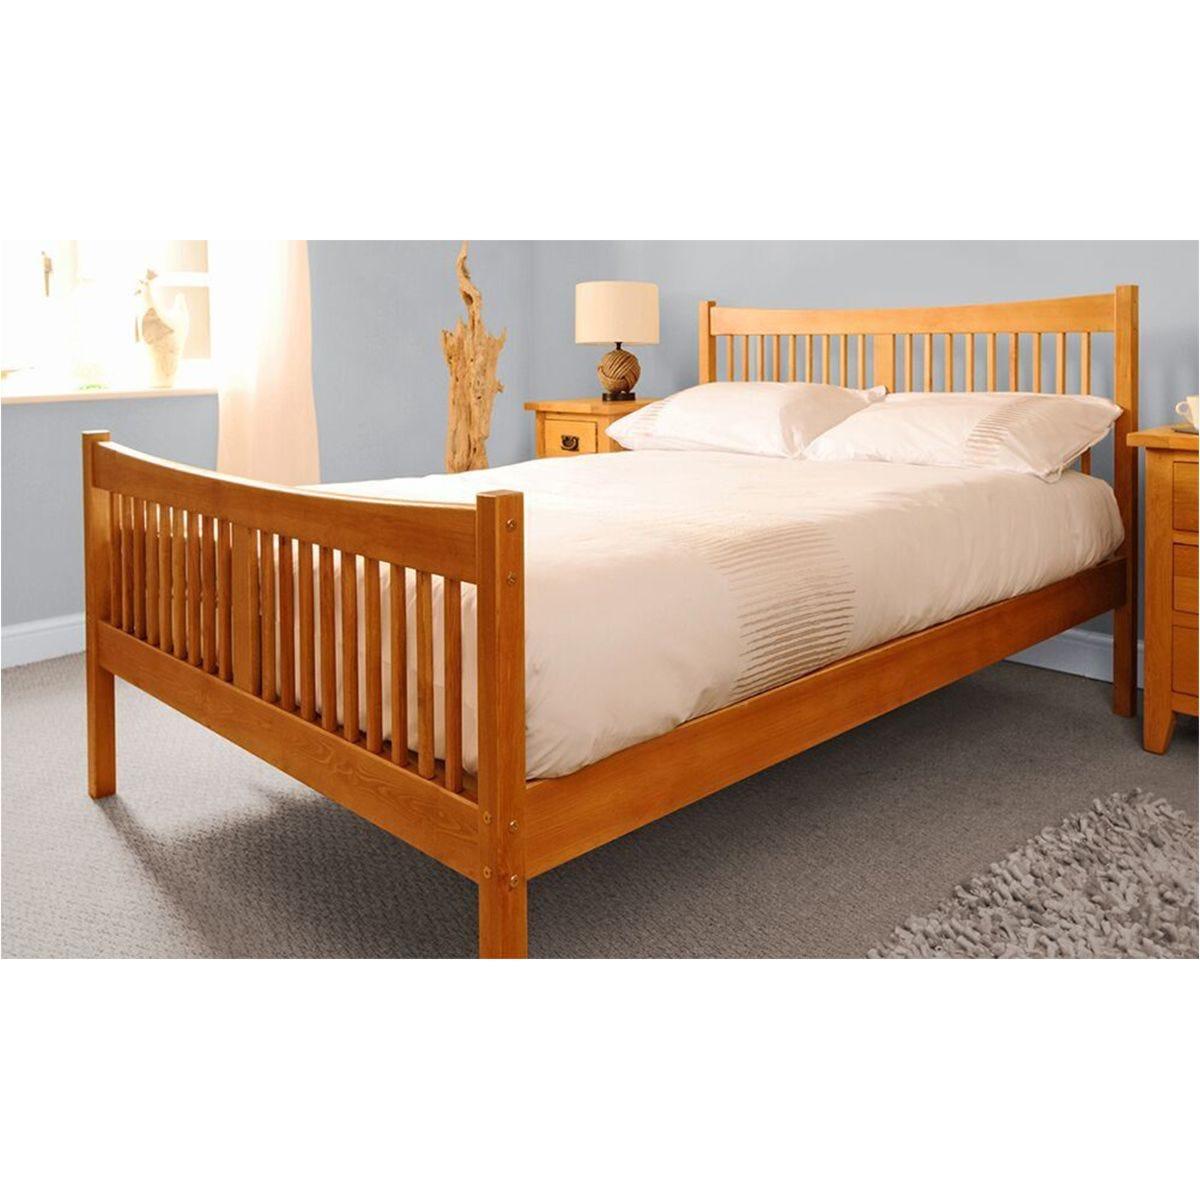 Balvi Bed Frame - Caramel